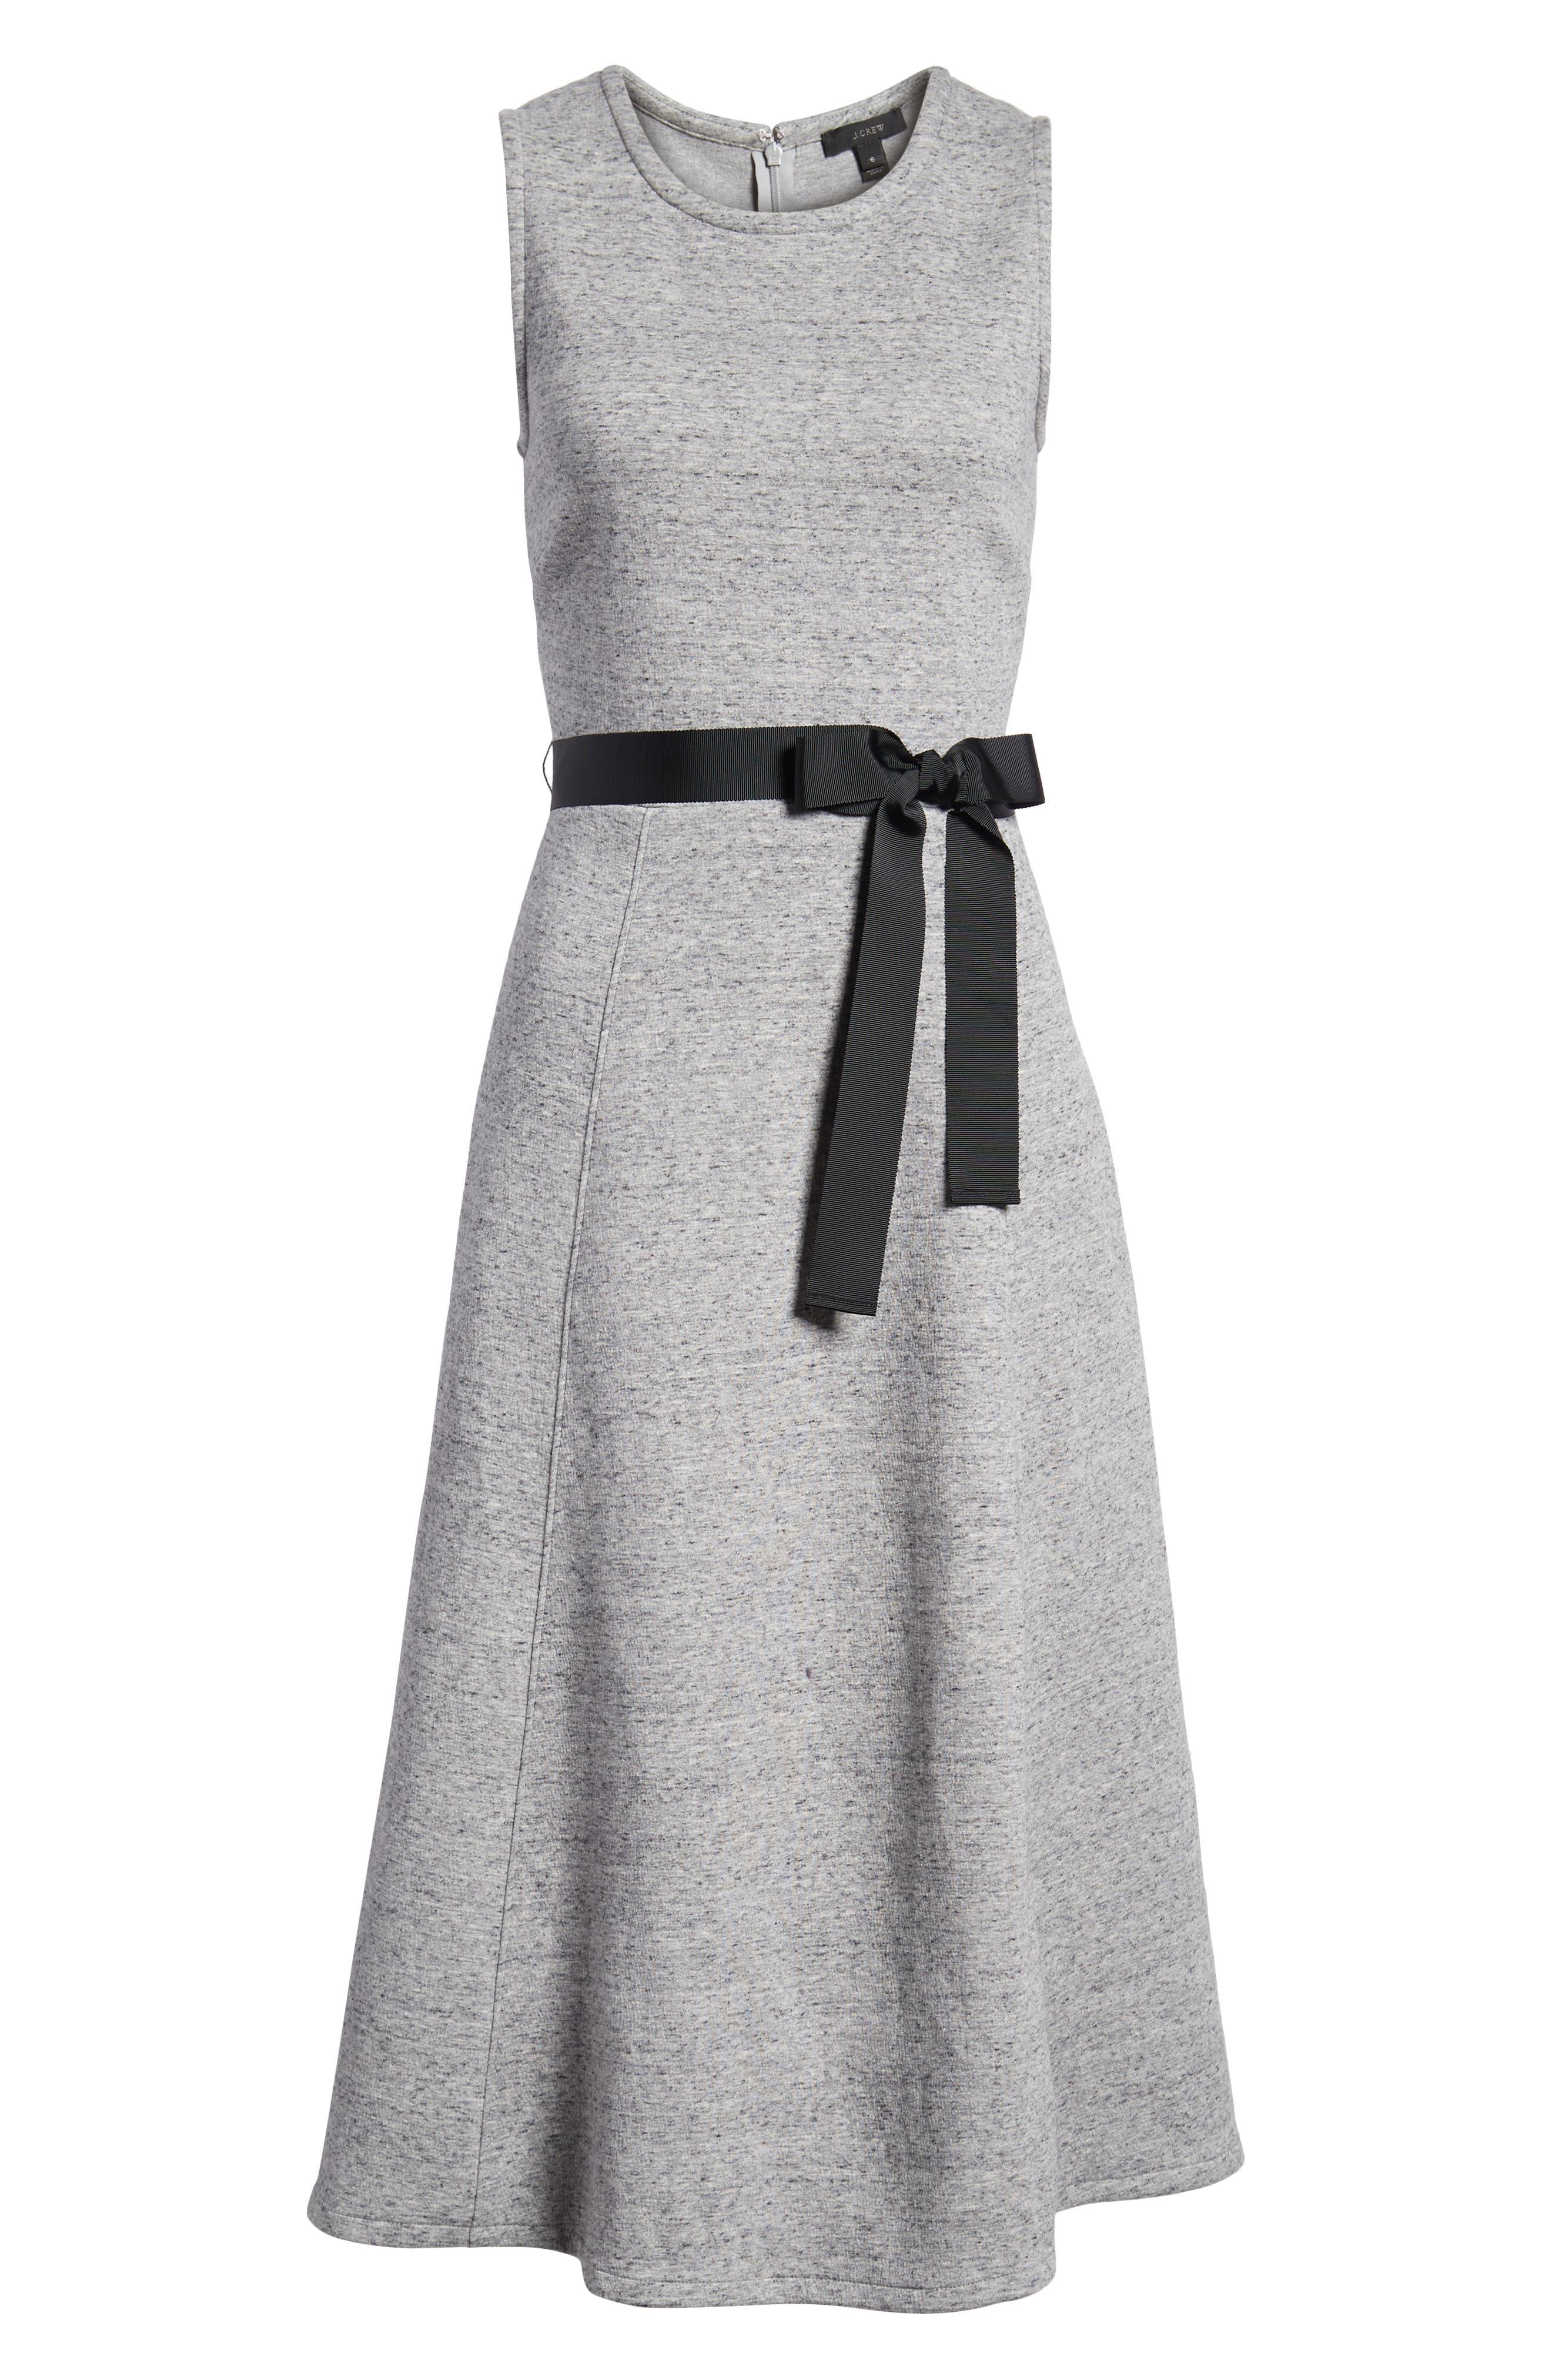 Velvet Tie A-Line Dress,                             Alternate thumbnail 8, color,                             020